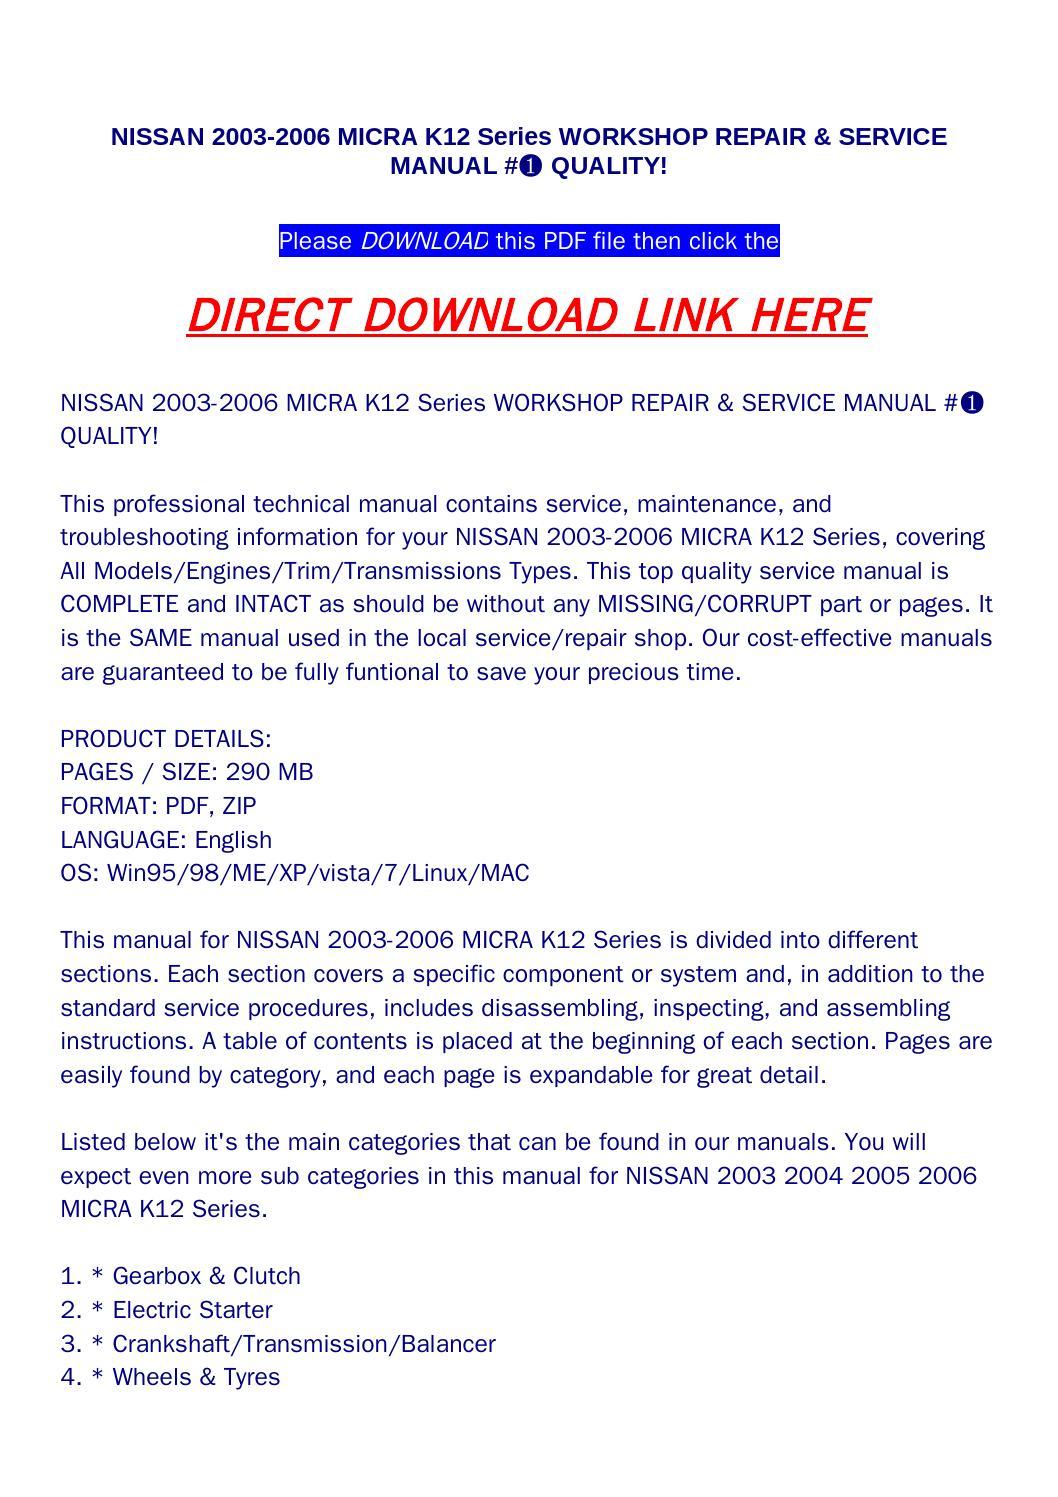 Nissan 2003 2006 micra k12 series workshop repair & service manual #➀  quality! by bonus300 - issuu